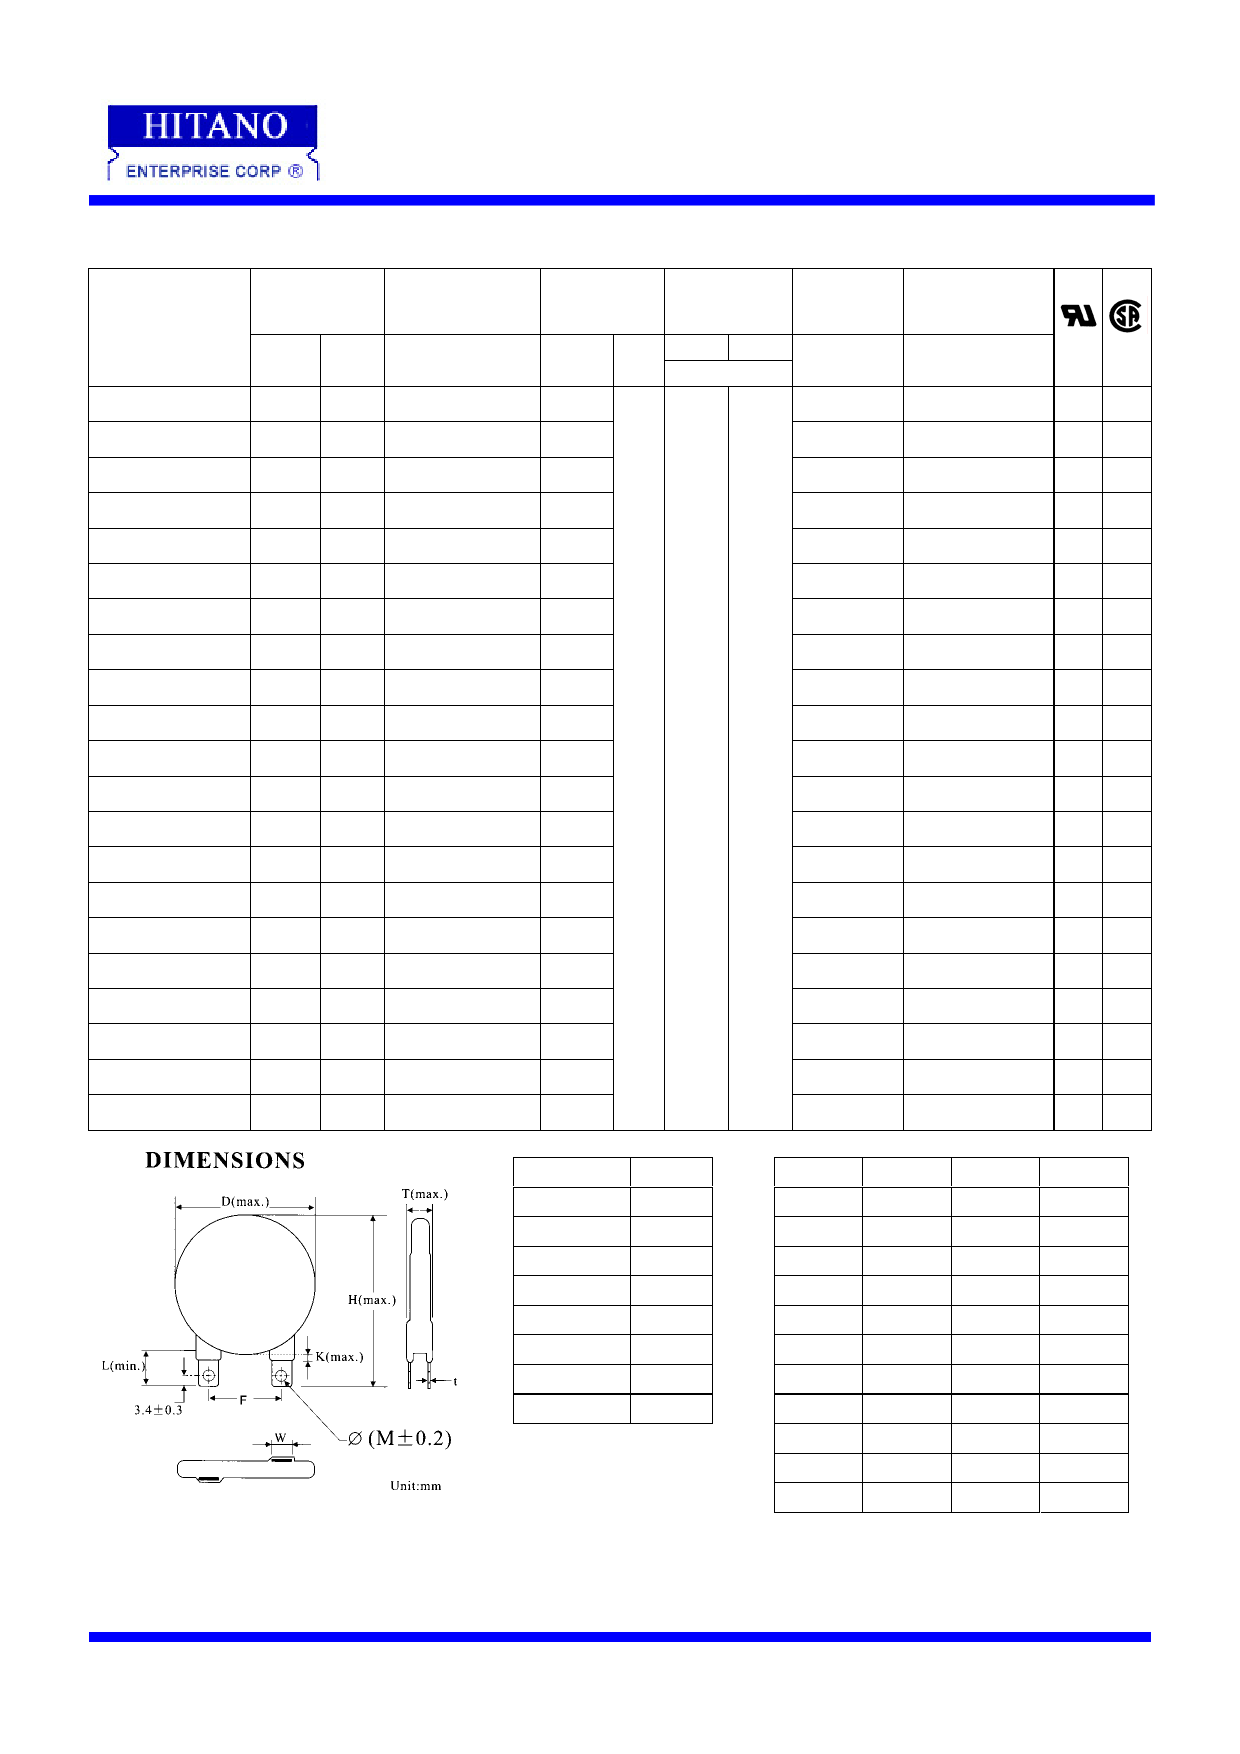 VCR-32D511K datasheet